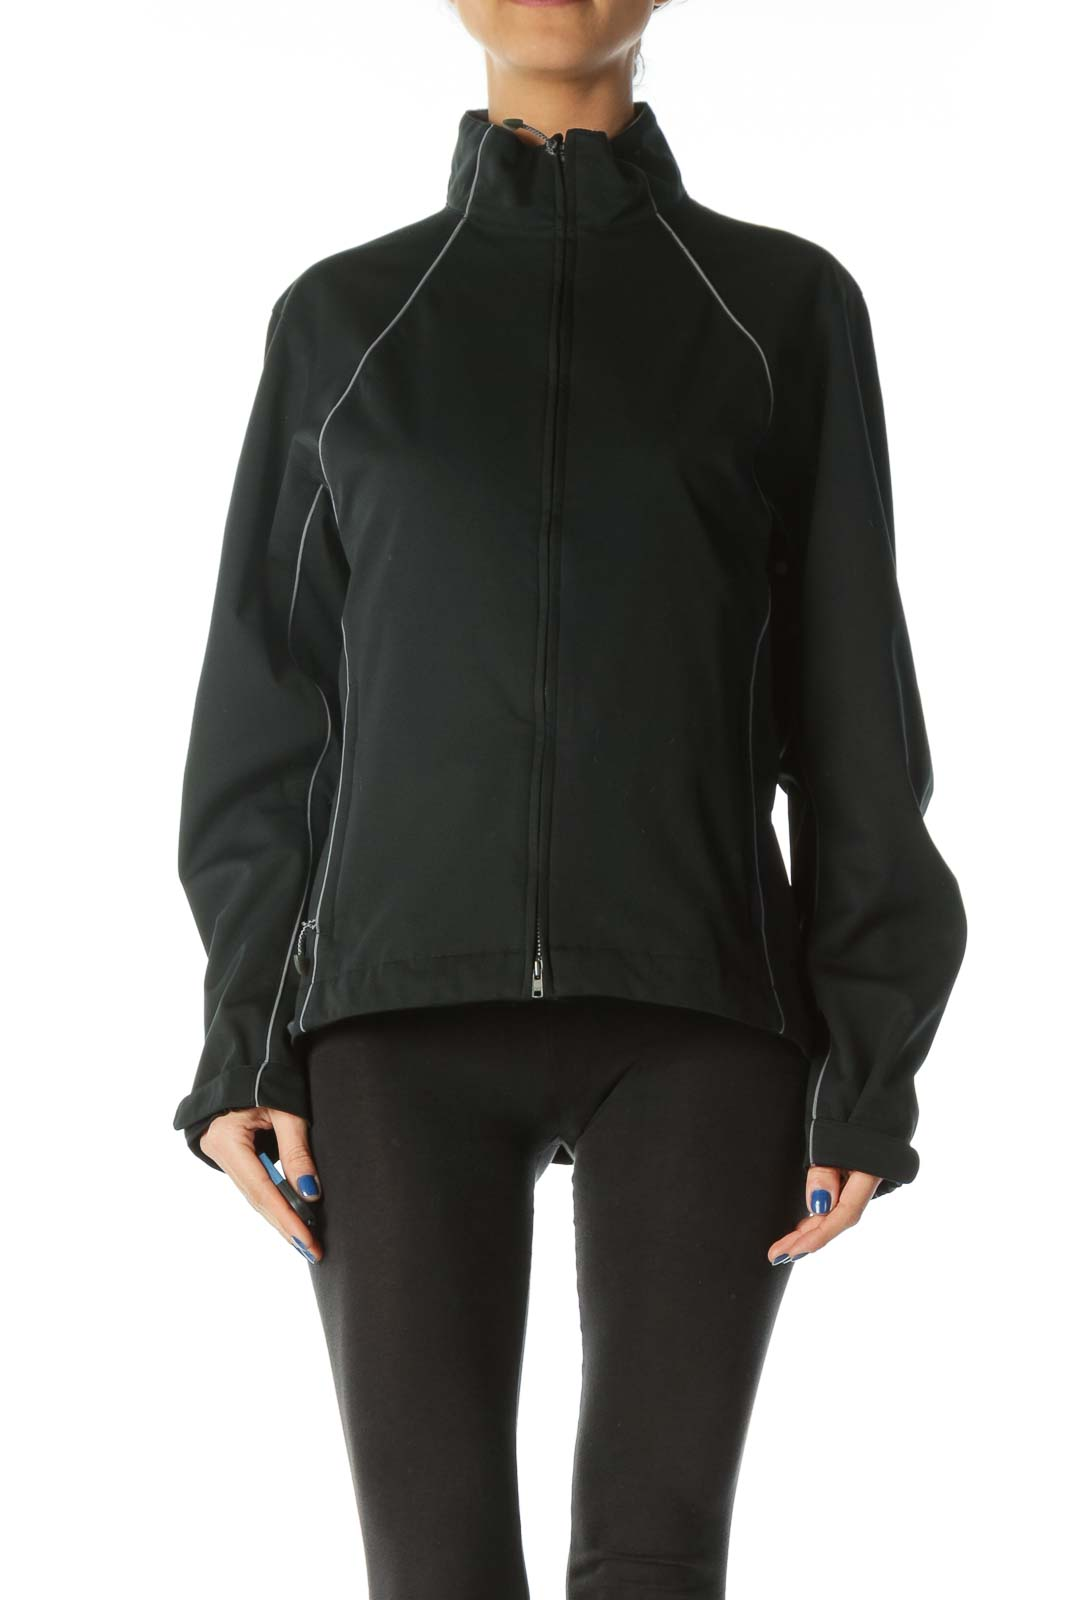 Black and Gray Sports Jacket